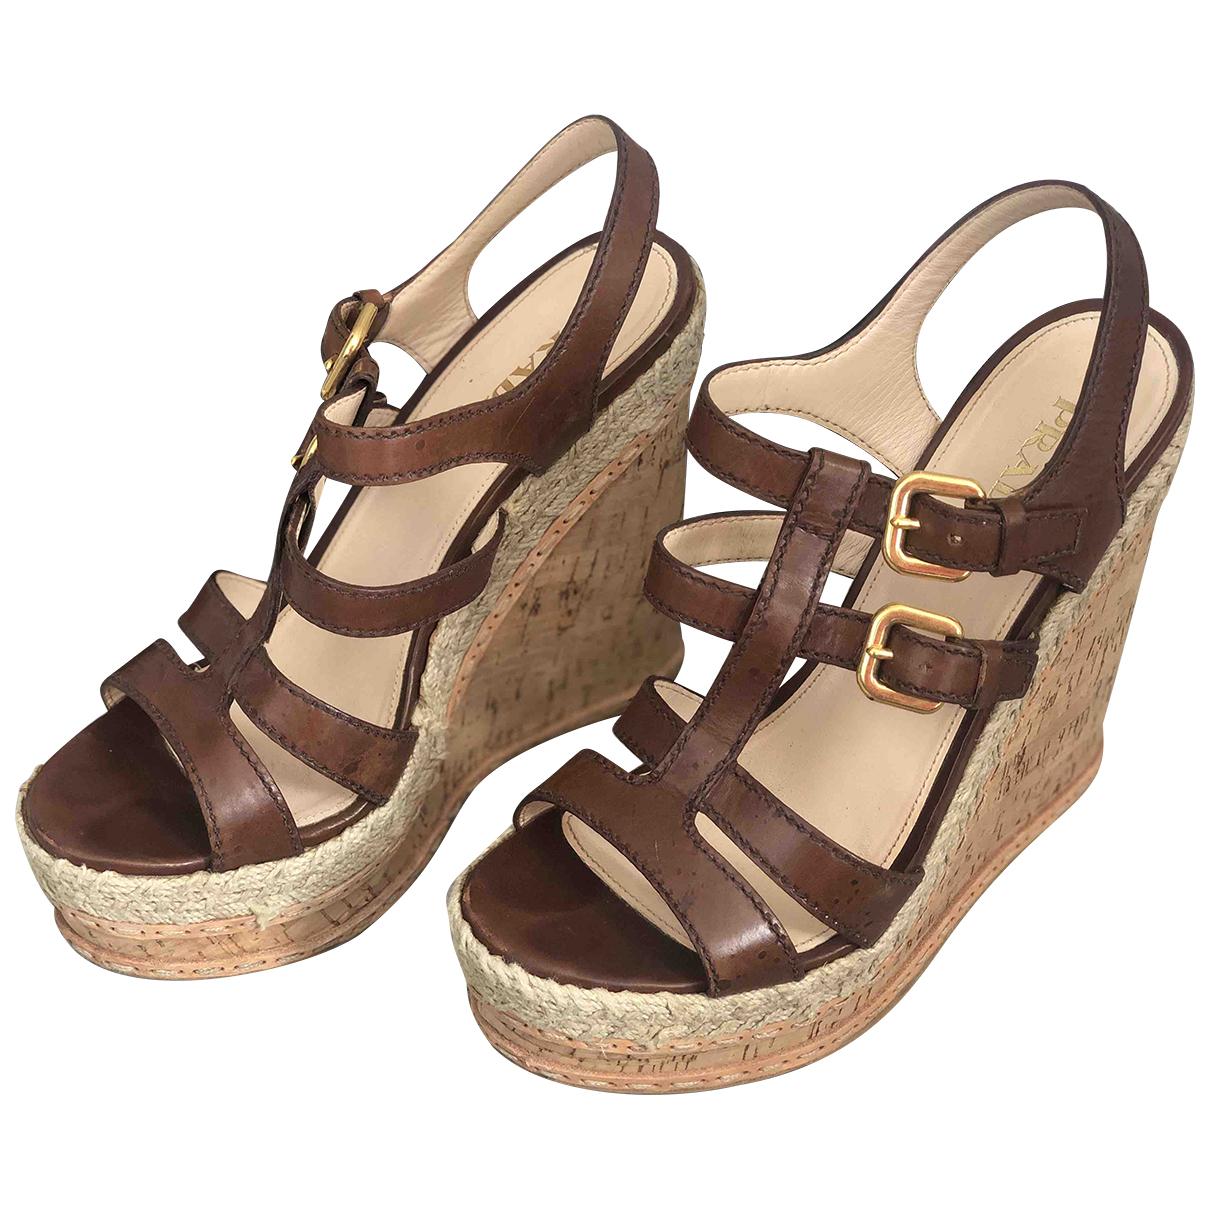 Prada \N Brown Leather Espadrilles for Women 40 EU